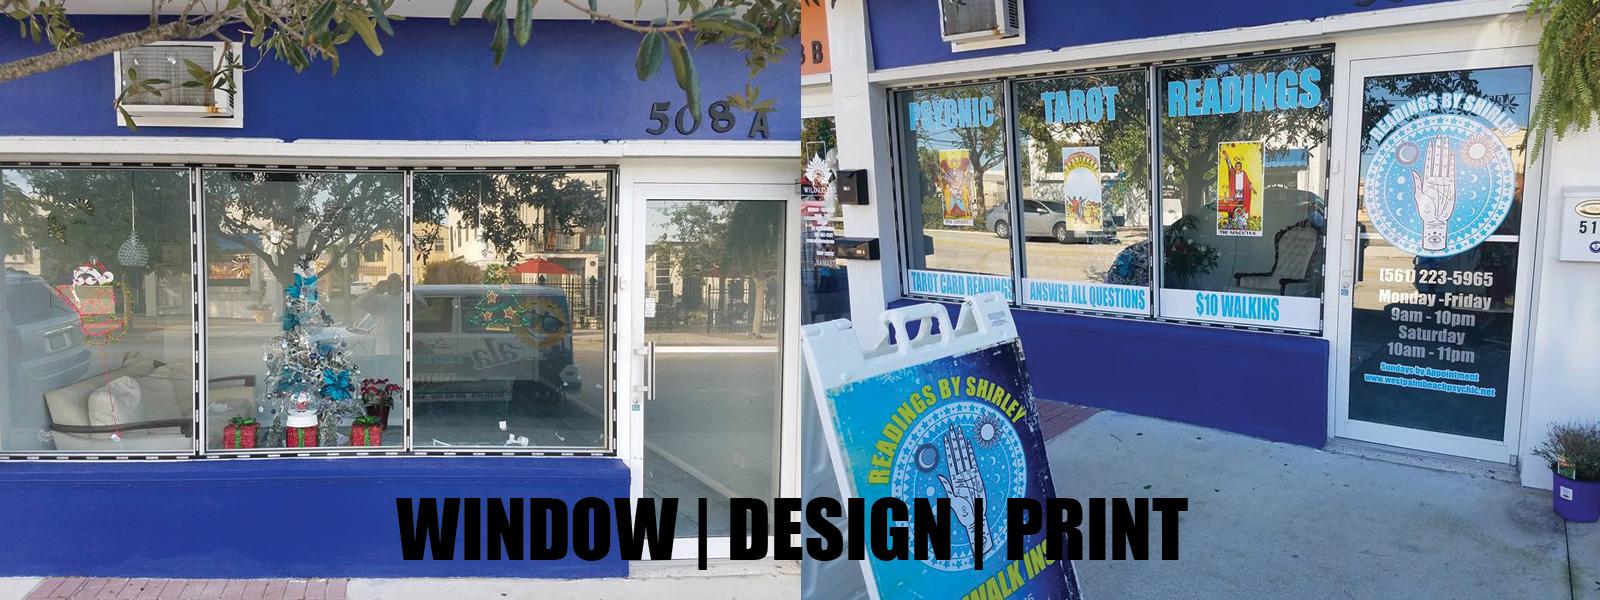 WINDOW-DECALS-_-DESIGN-_-PRINT